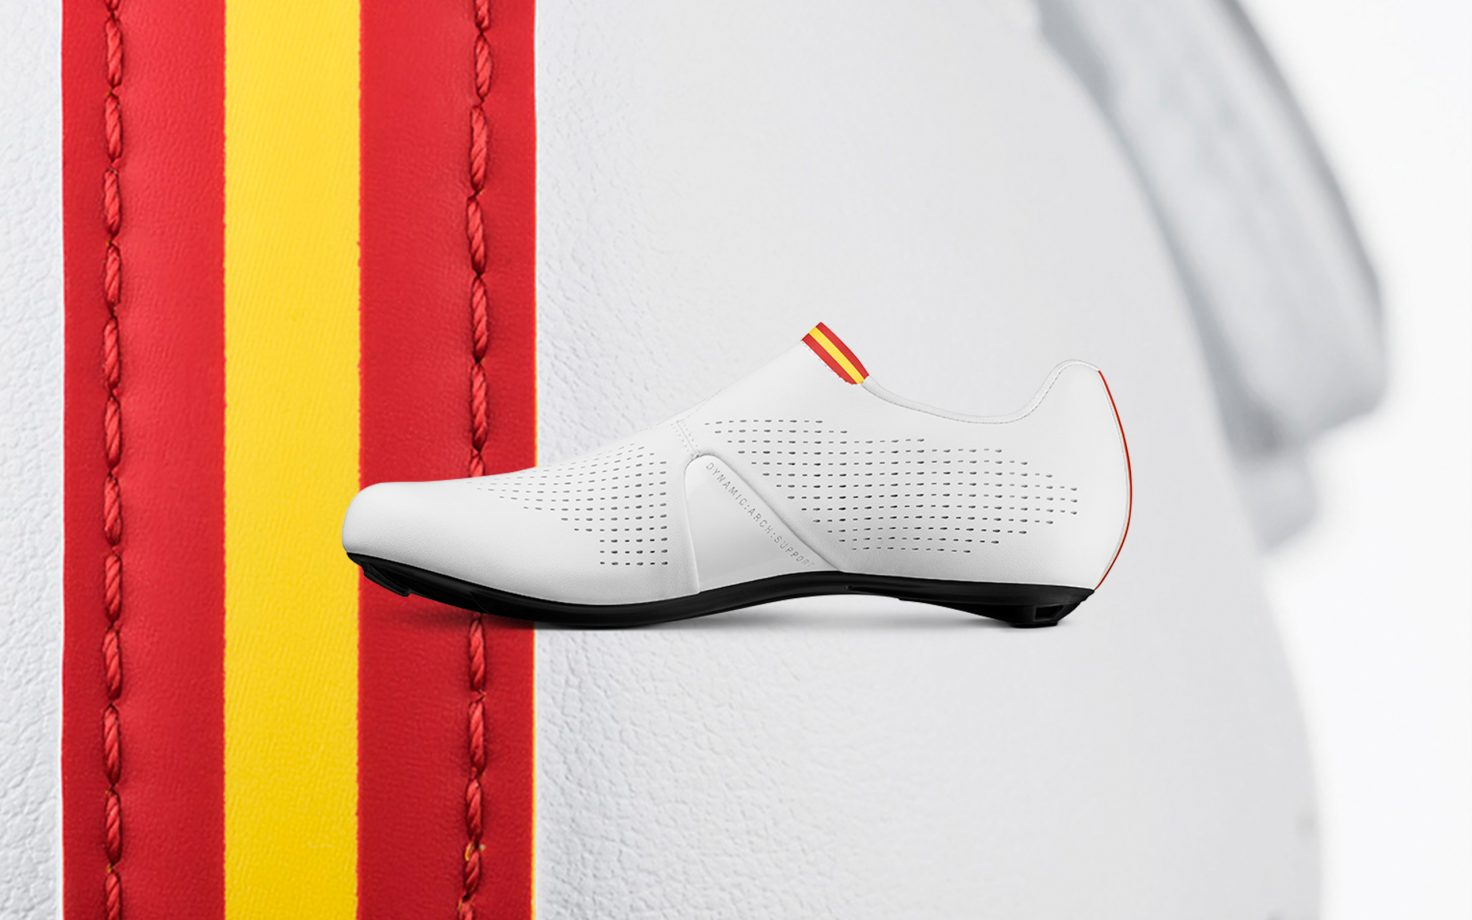 Imagen de la noticia 'Fizik to release Valverde's Infinito R1 shoes – and we've got one pair for you (17-23 junio)'